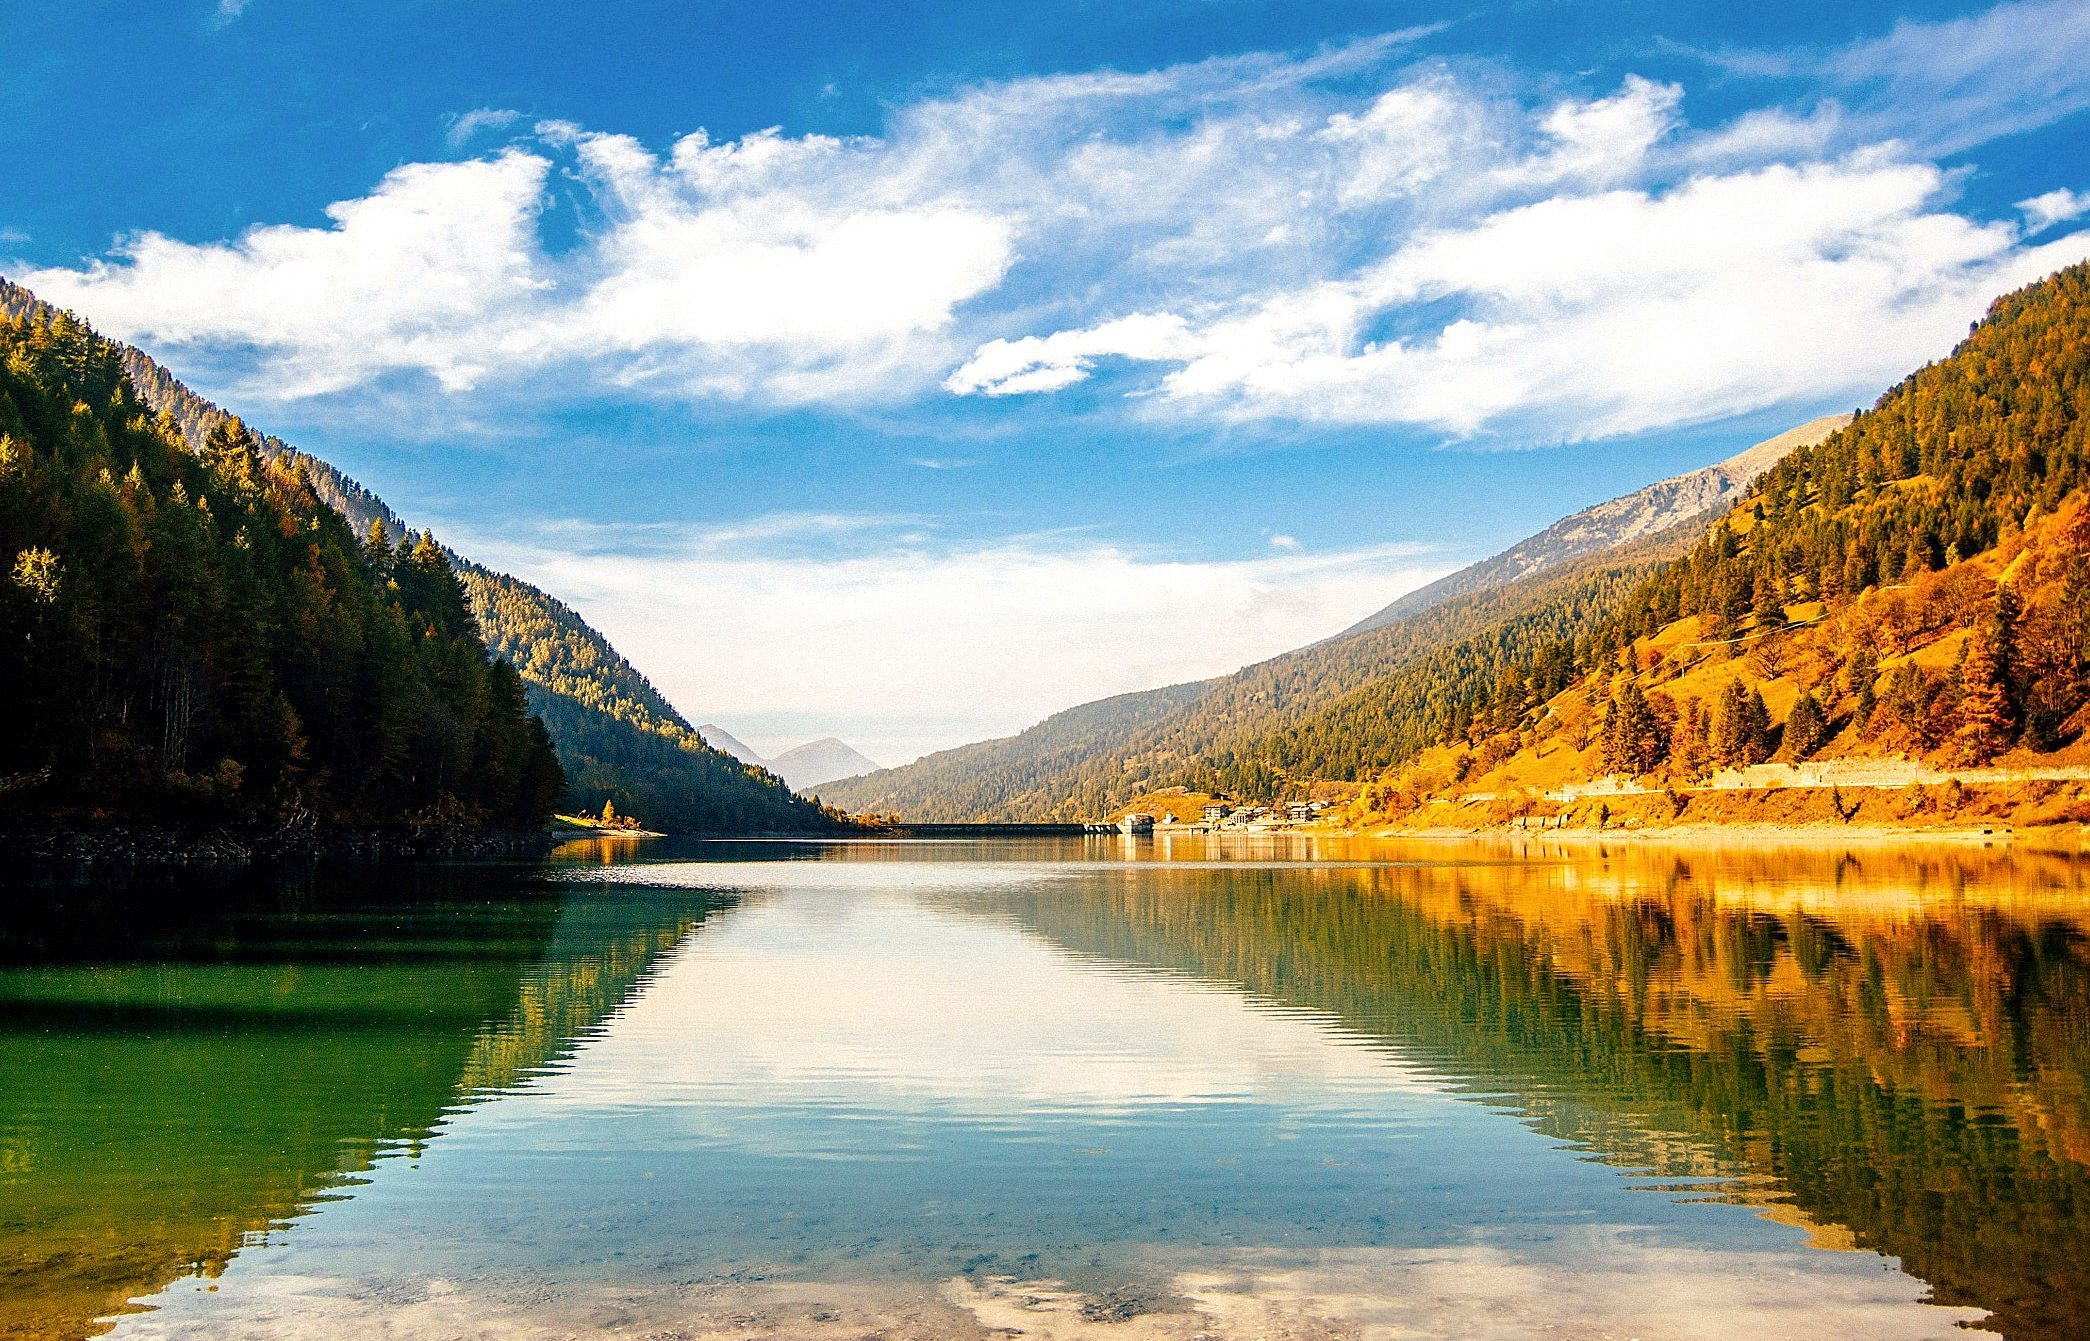 landscape, mountains, lake, sky